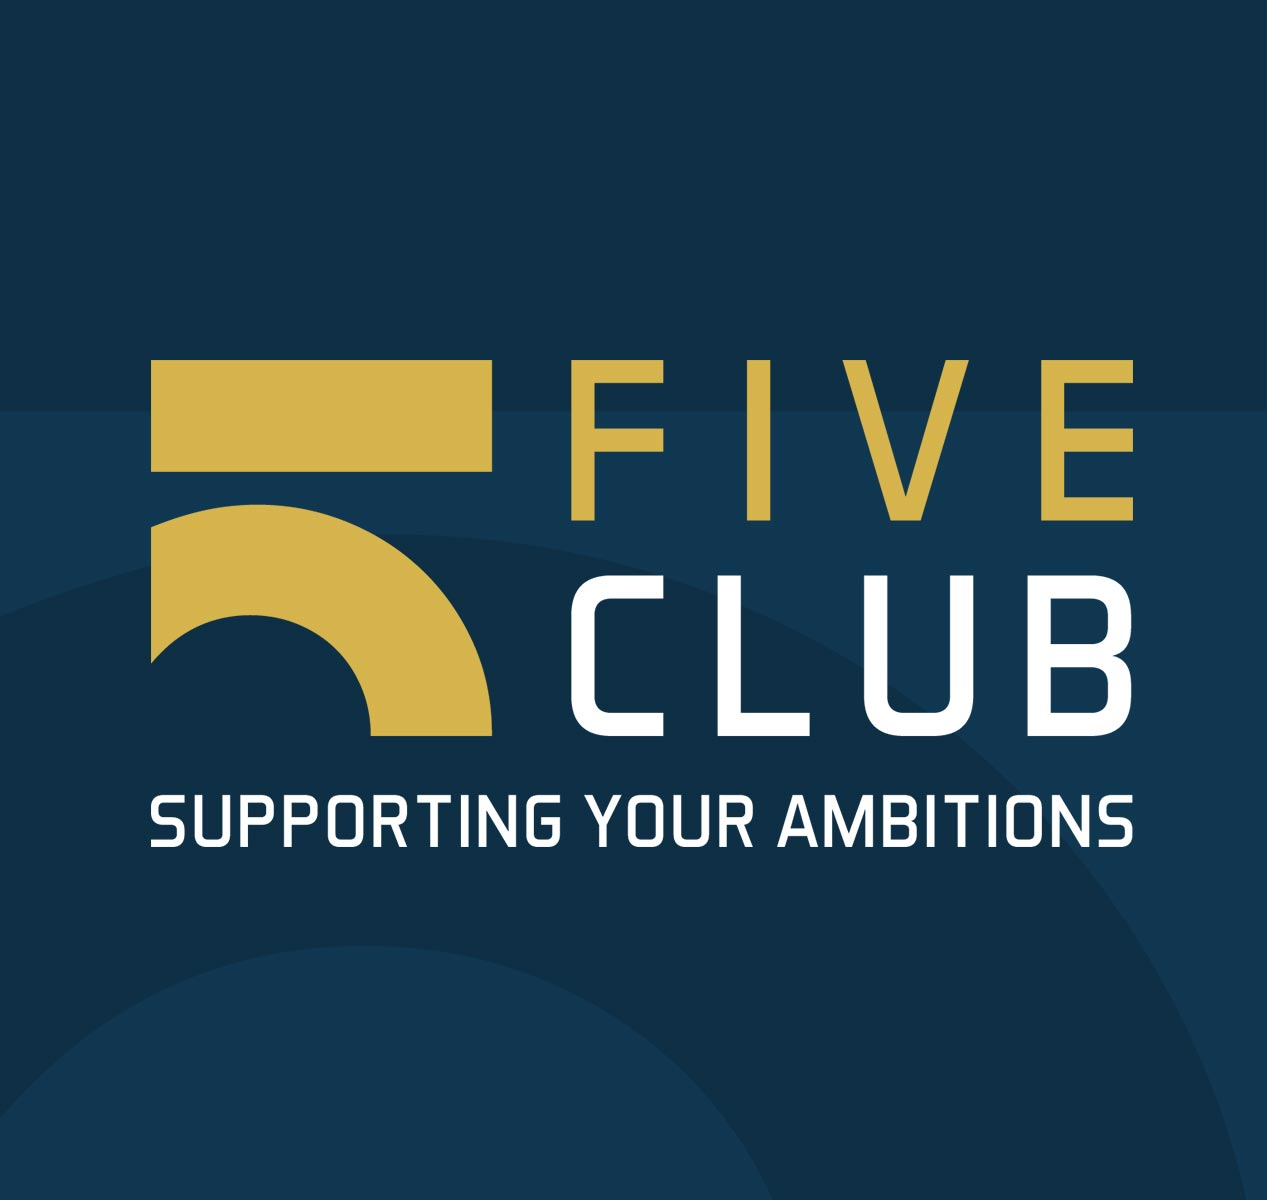 Five Club Logo